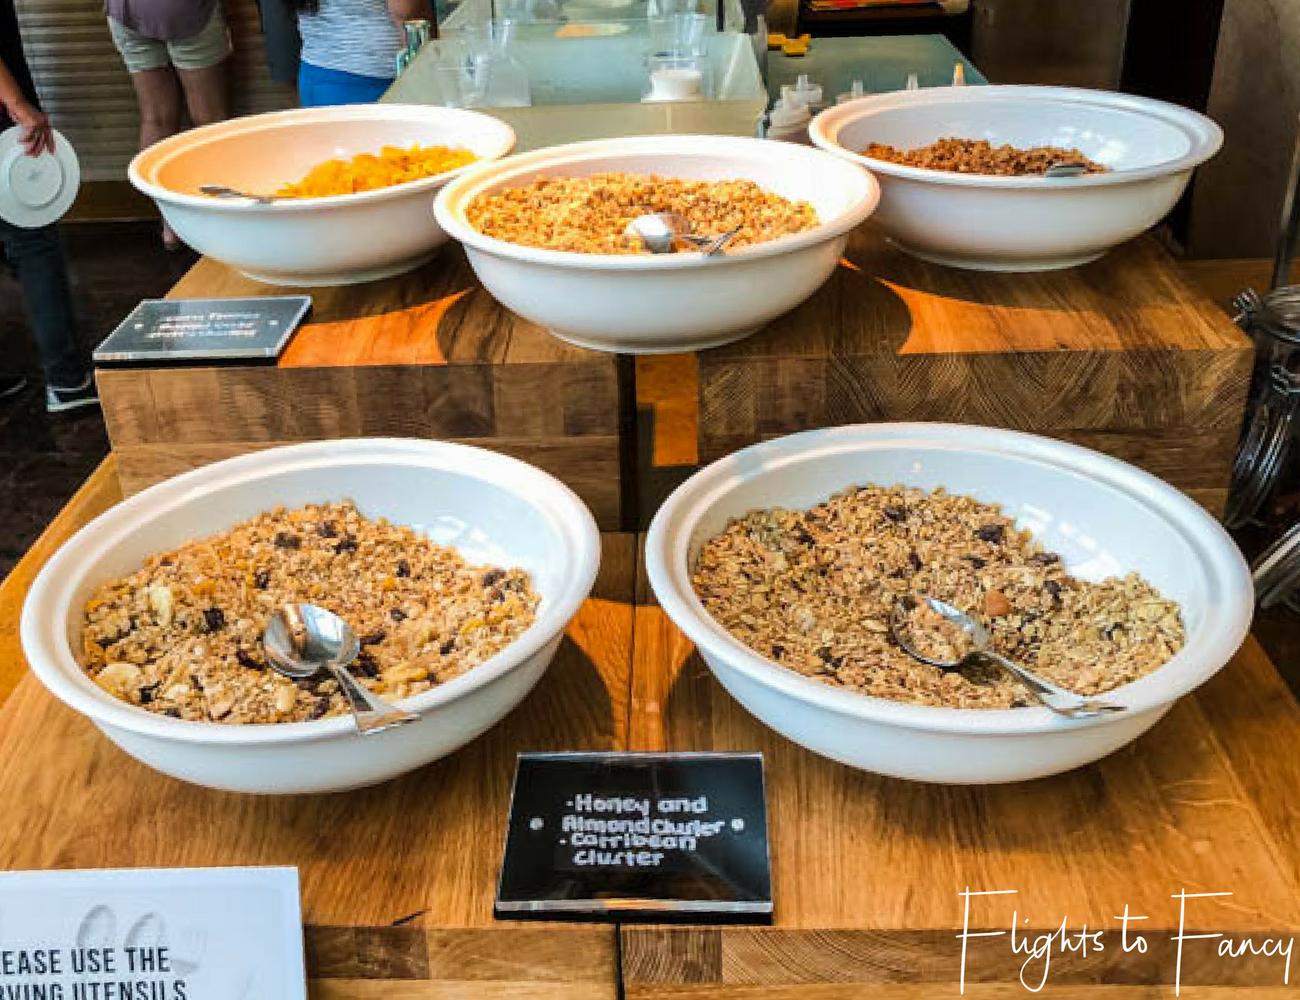 Flights To Fancy @ Raffles Makati Manila - Cereal Breakfast Buffet